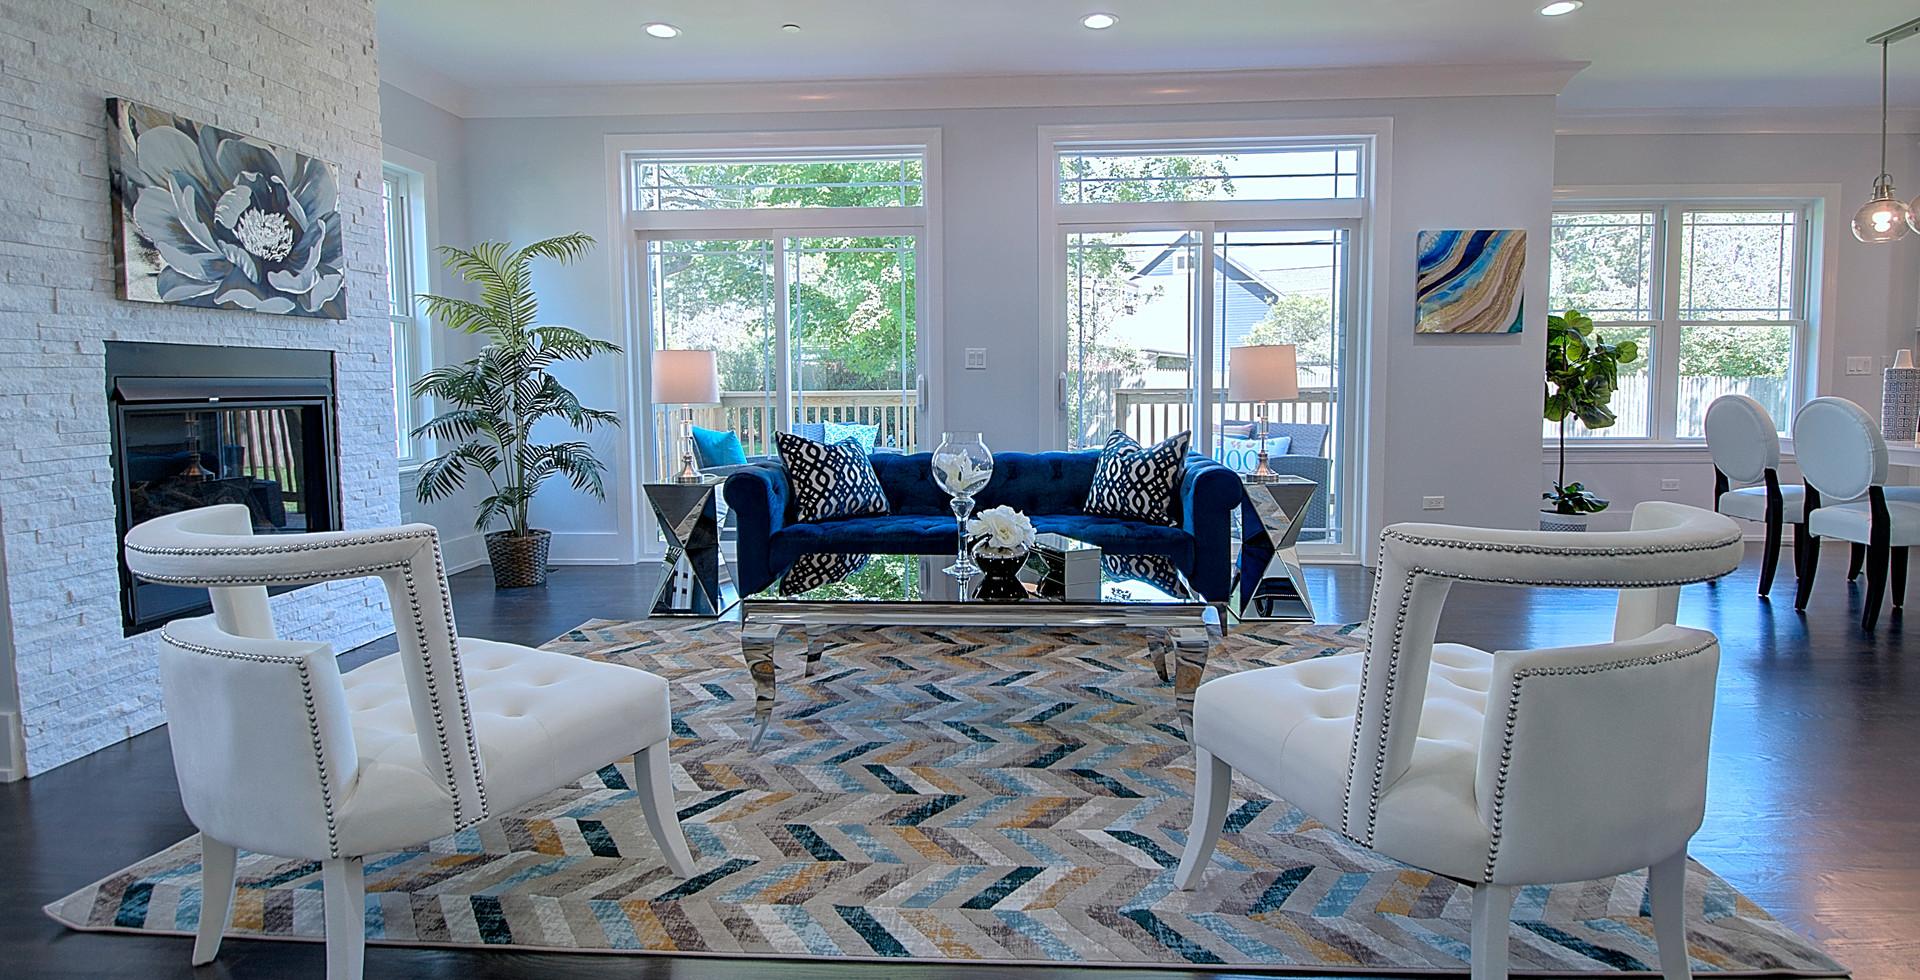 Living Room in Hinsdale designed by MRM Home Design.jpg